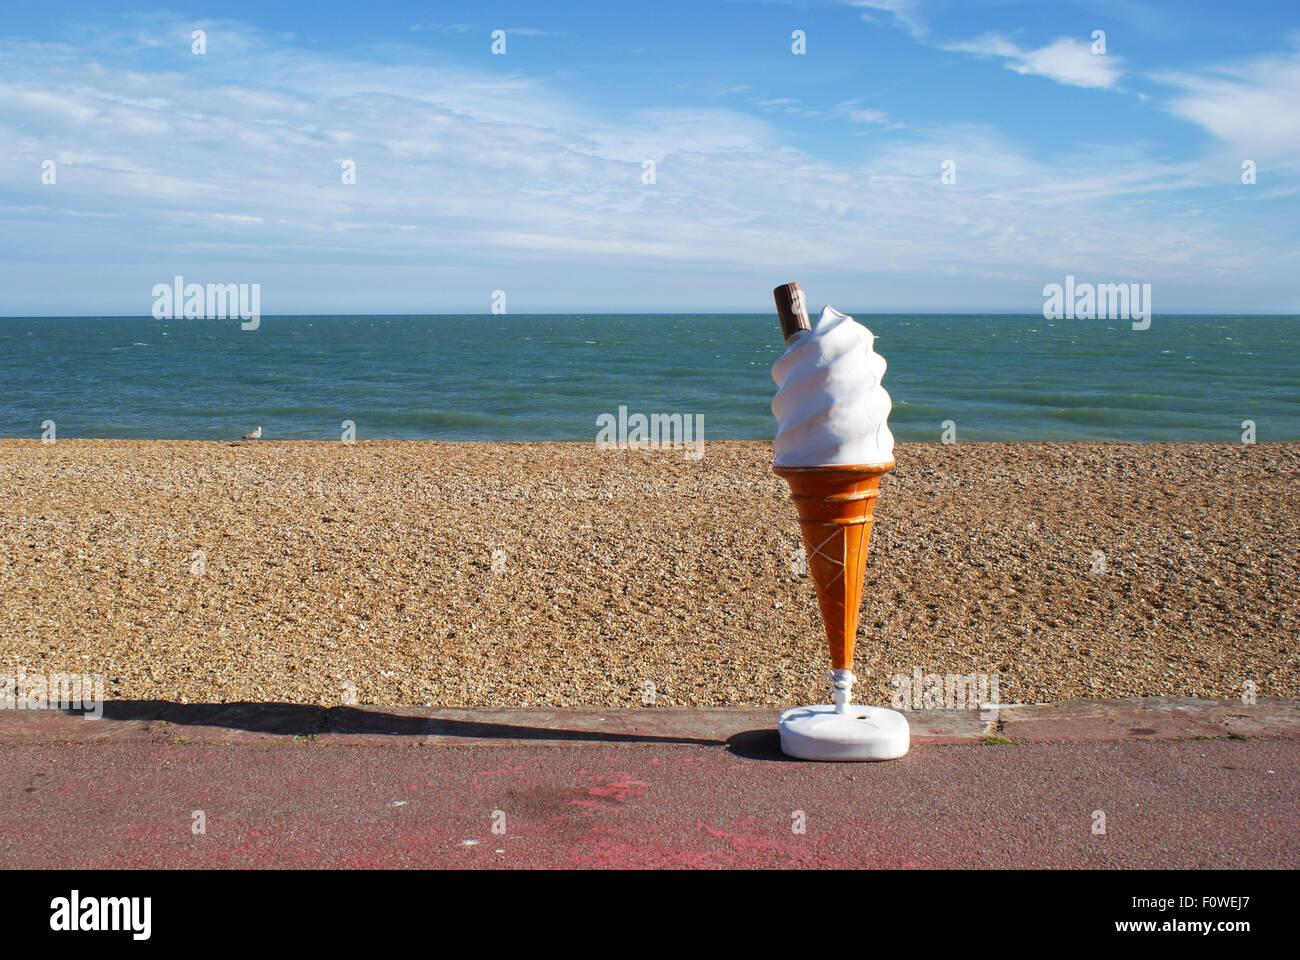 3D Ice Cream advertising display model at the Sandgate Beach, Kent